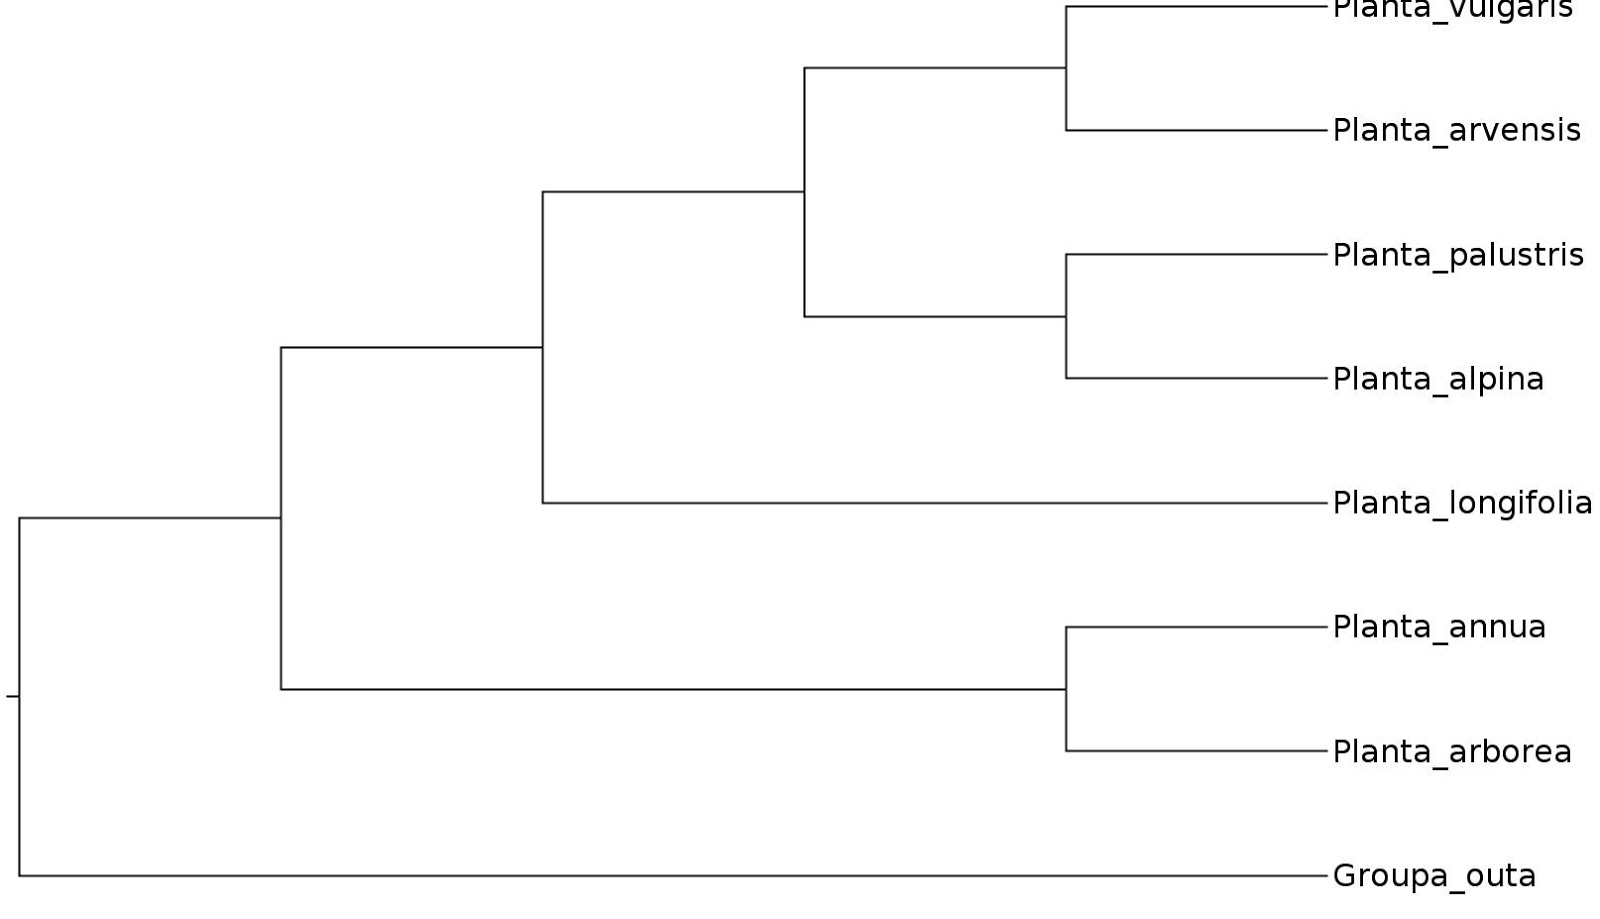 Branches Branching Tree Diagram 88 Fiero Radio Wiring Phylobotanist Types Of Phylogenetic Diagrams